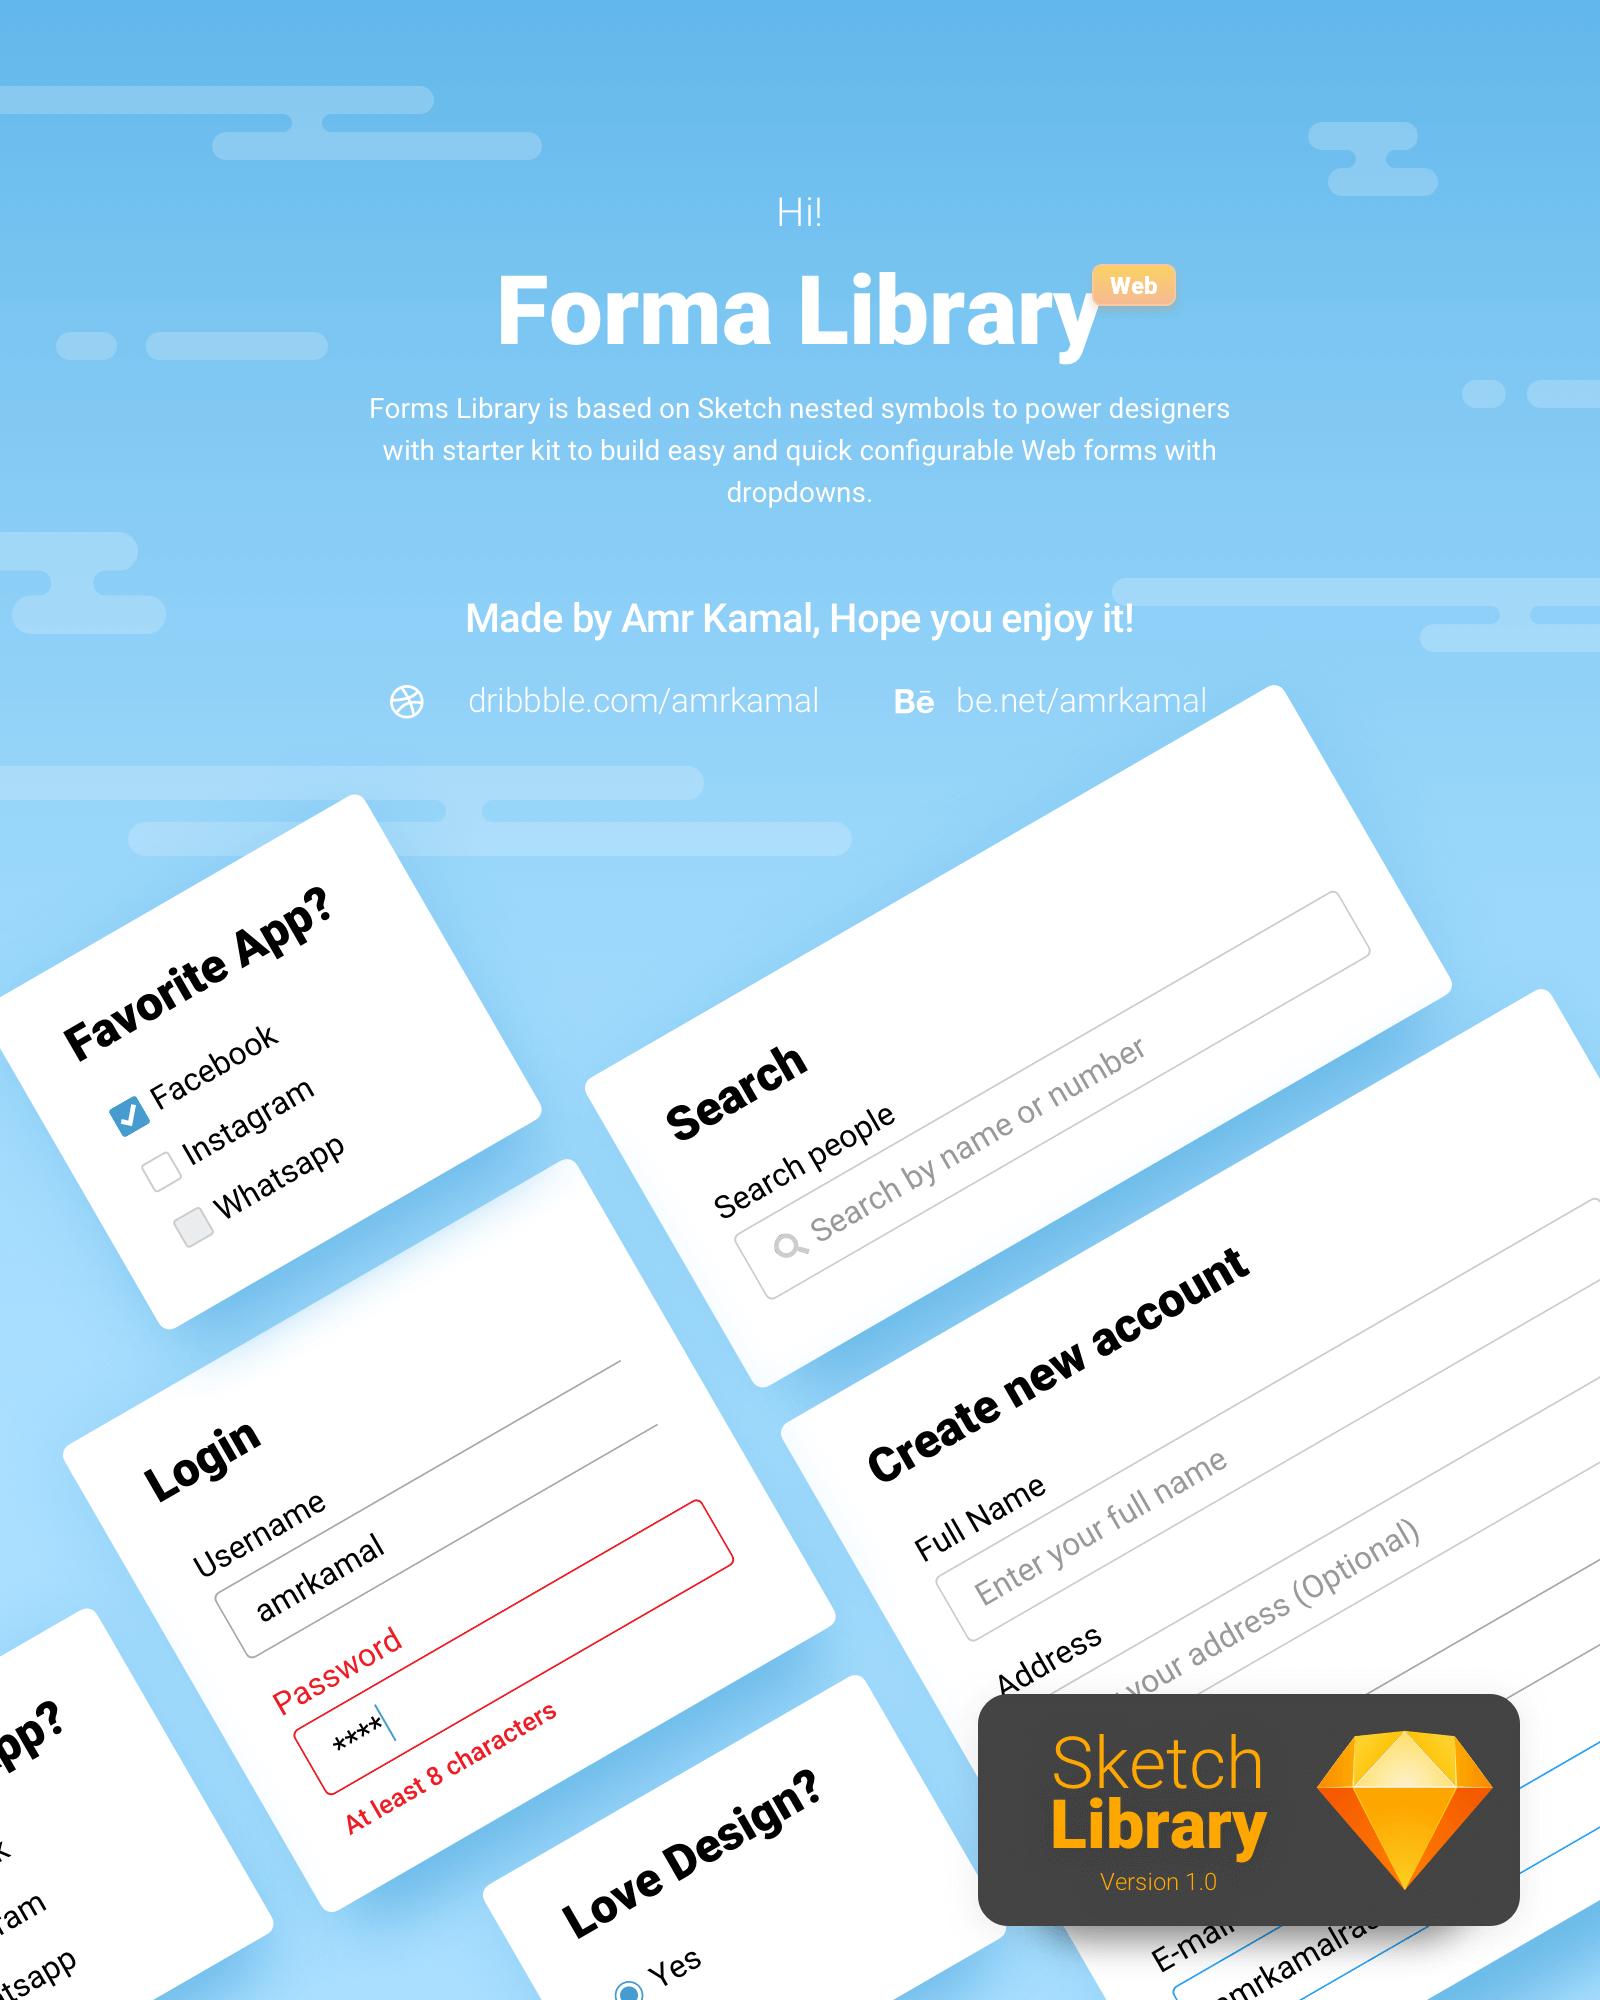 Forma Library presentation image